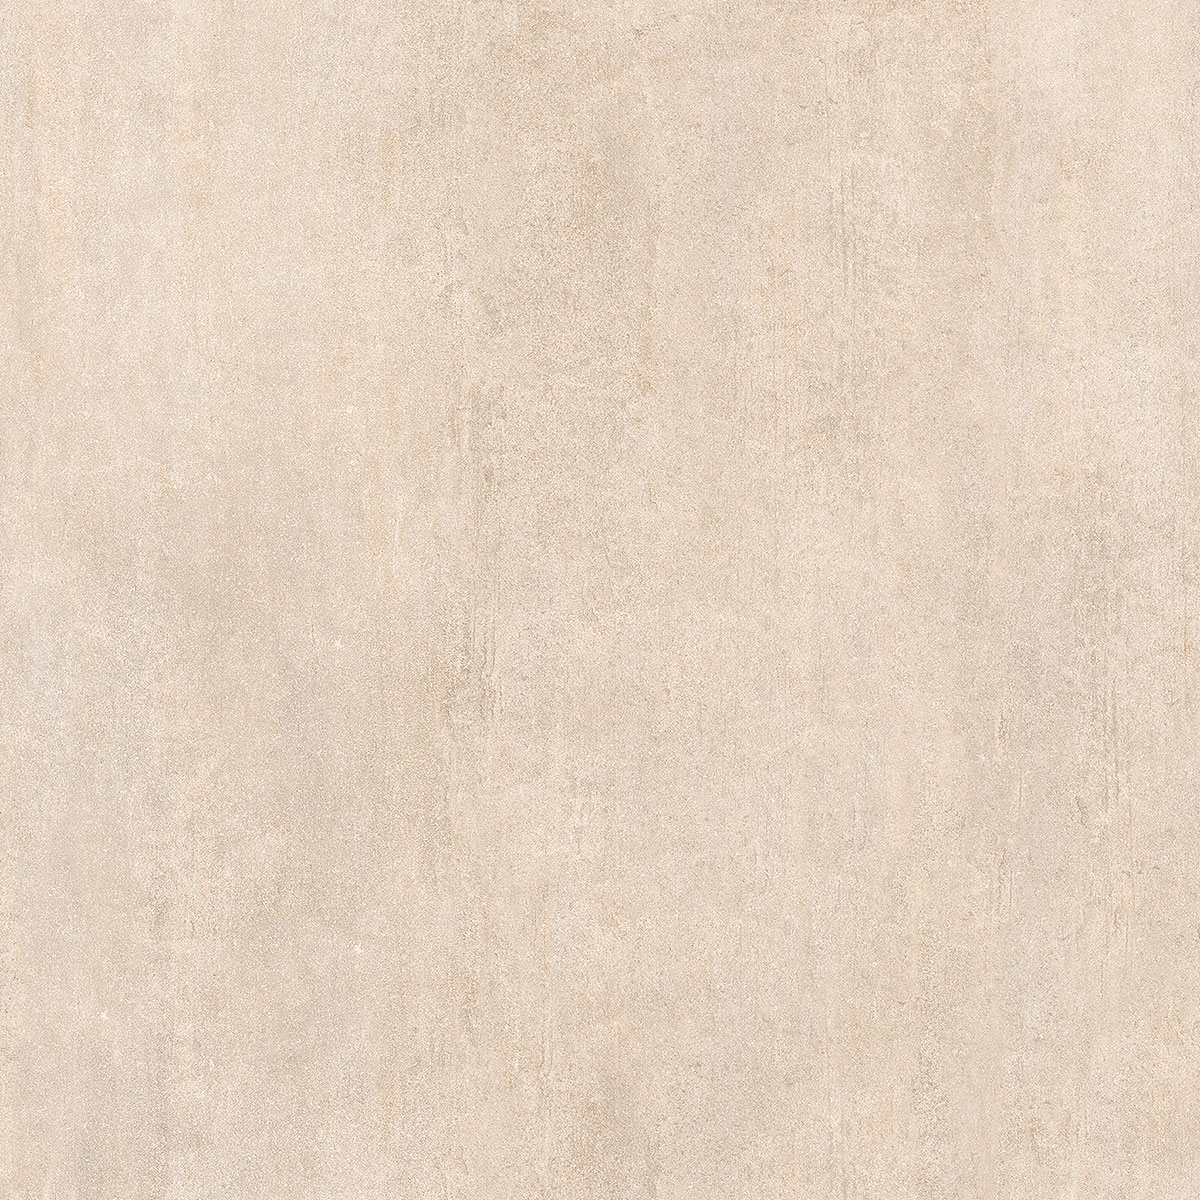 CAIRO beige Image